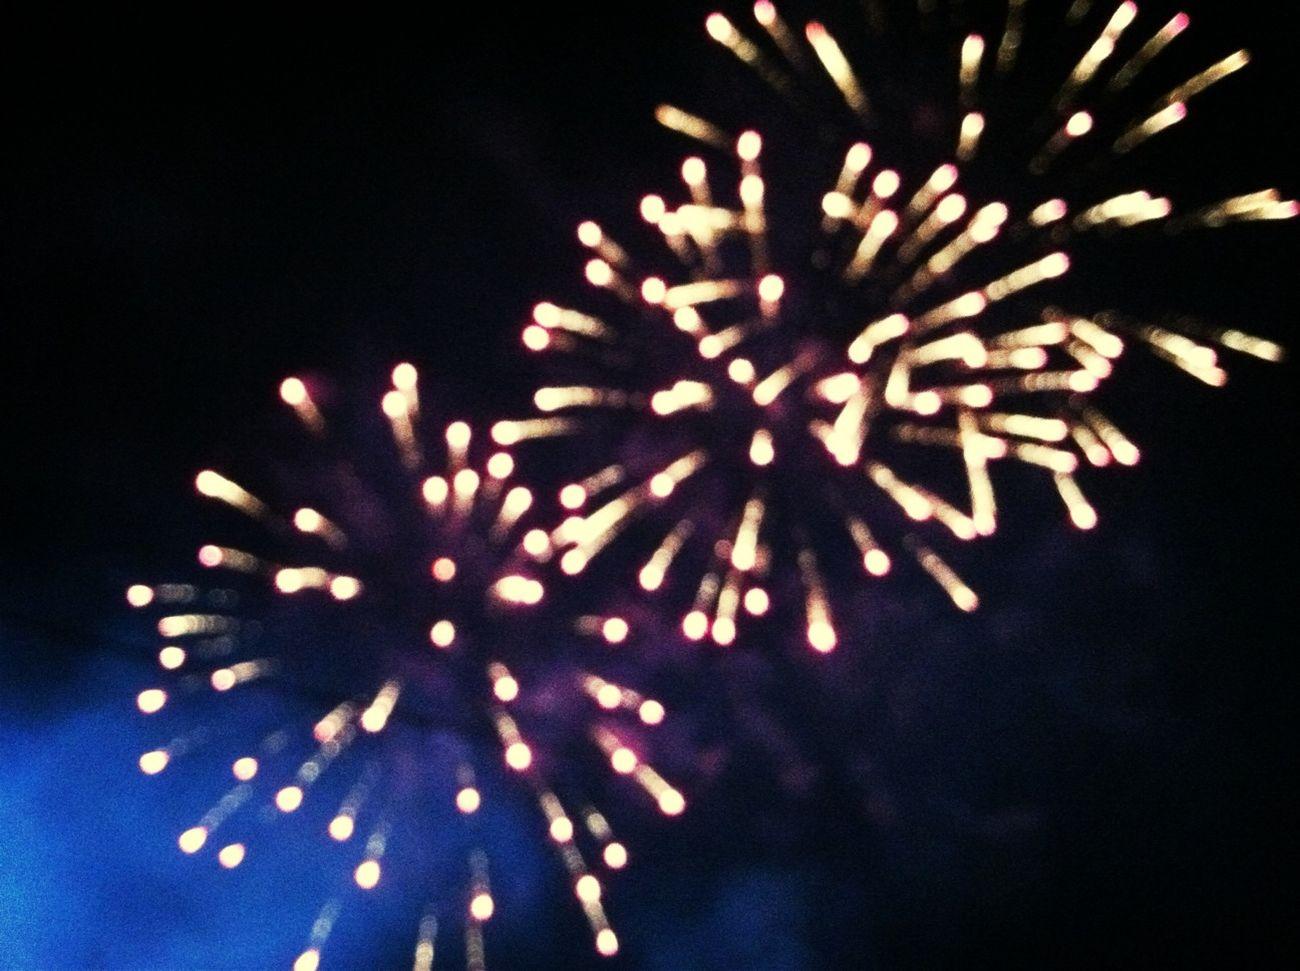 Bokeh Fireworks HDR Outdoors